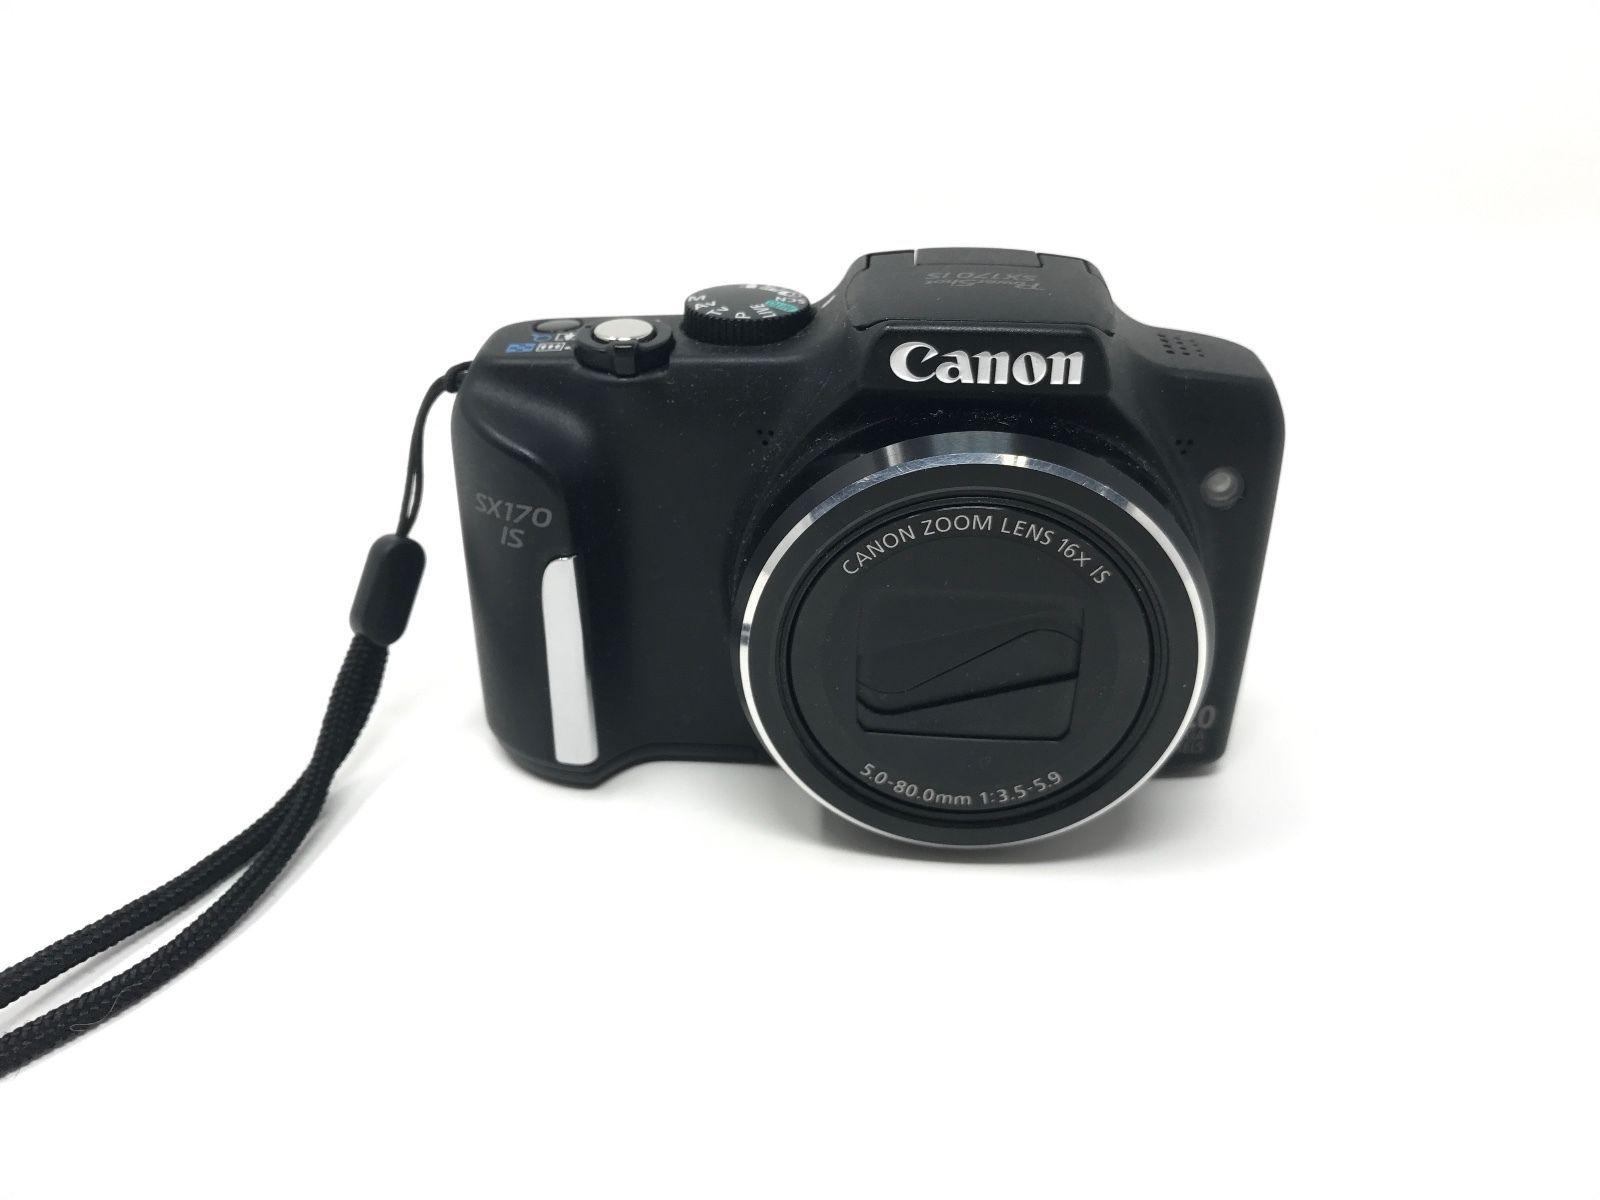 Canon Powershot Sx170 Is 16mp Digital Camera 52 00 16 Bids End Date Saturday Aug 19 2017 17 00 46 Pdt Bid No Digital Camera Canon Digital Camera Powershot